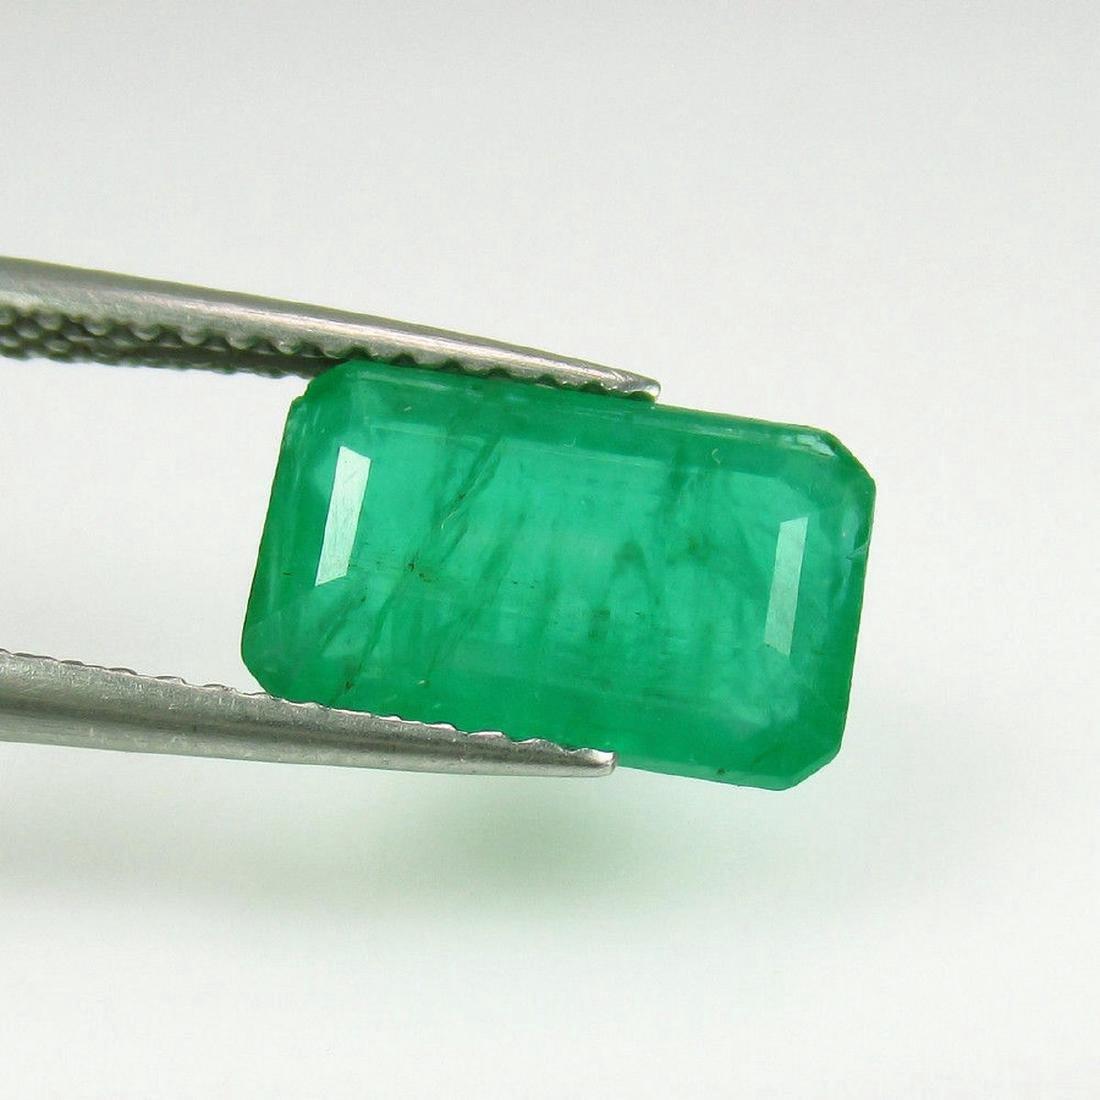 2.43 Carat Loose Zambian Emerald Octagon Stone